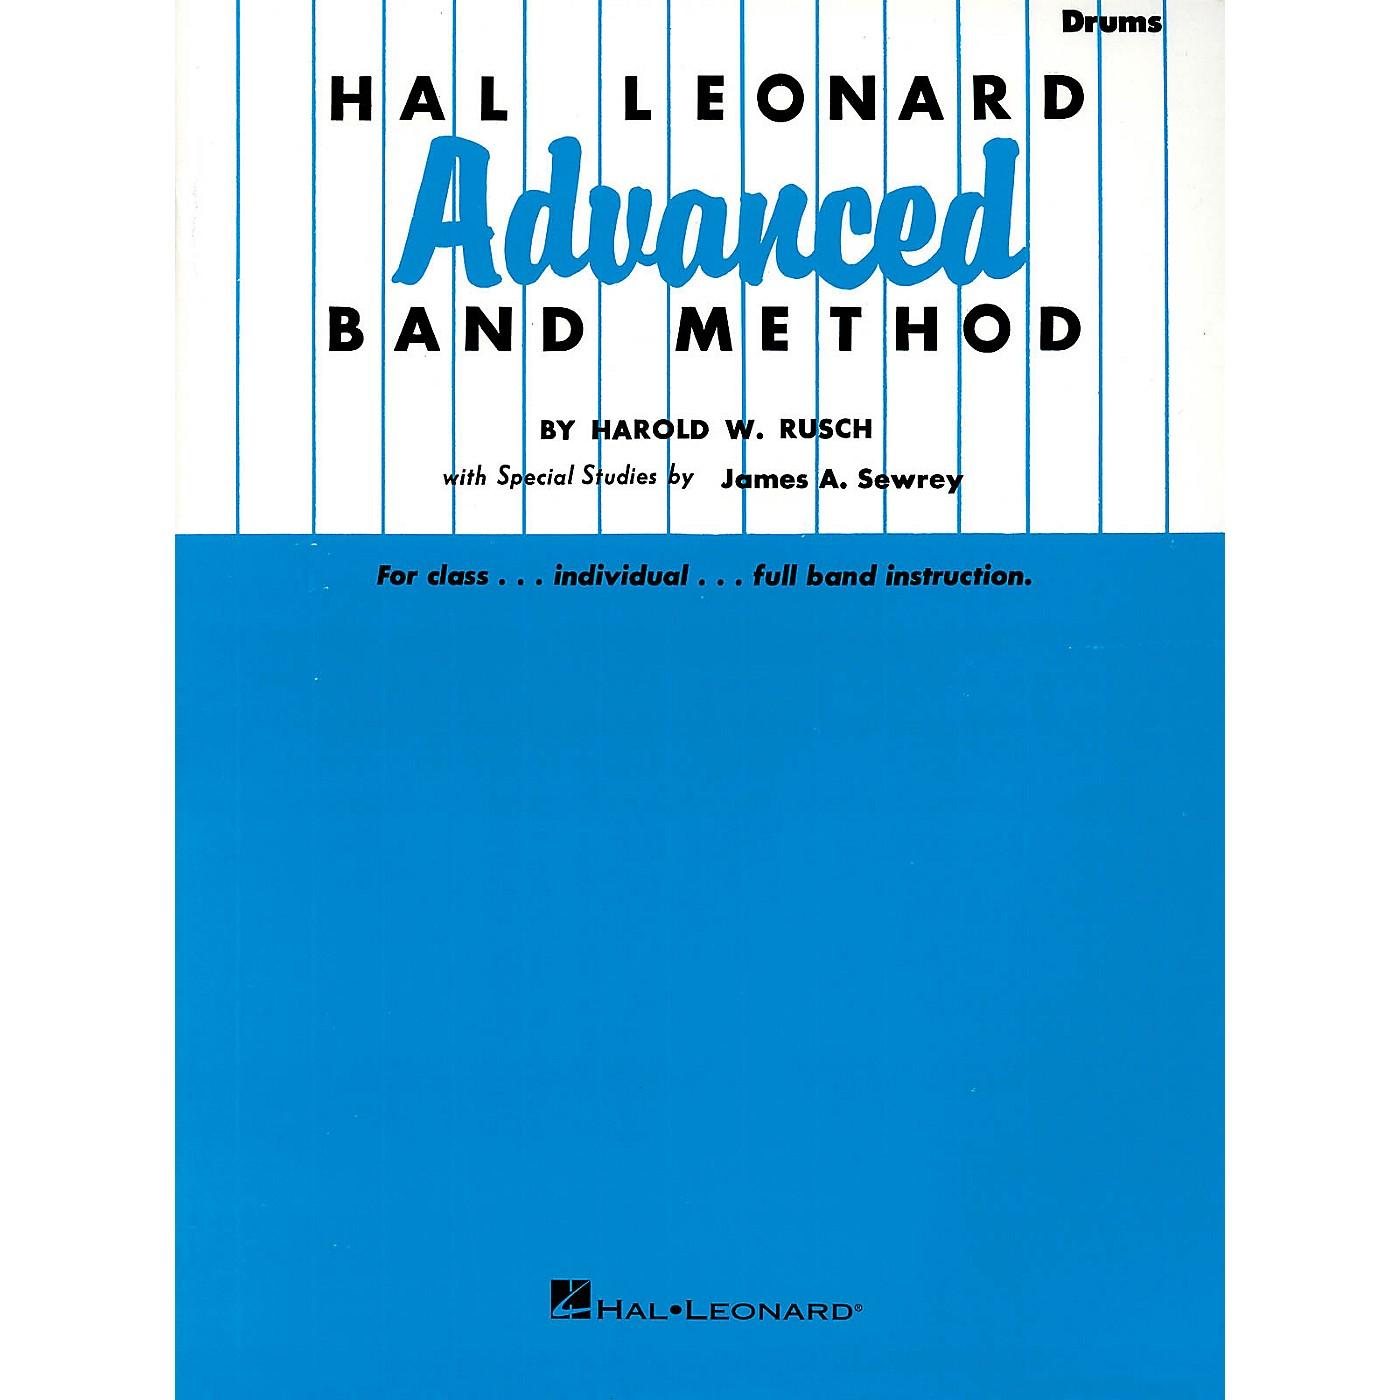 Hal Leonard Hal Leonard Advanced Band Method (Drums) Advanced Band Method Series Composed by Harold W. Rusch thumbnail